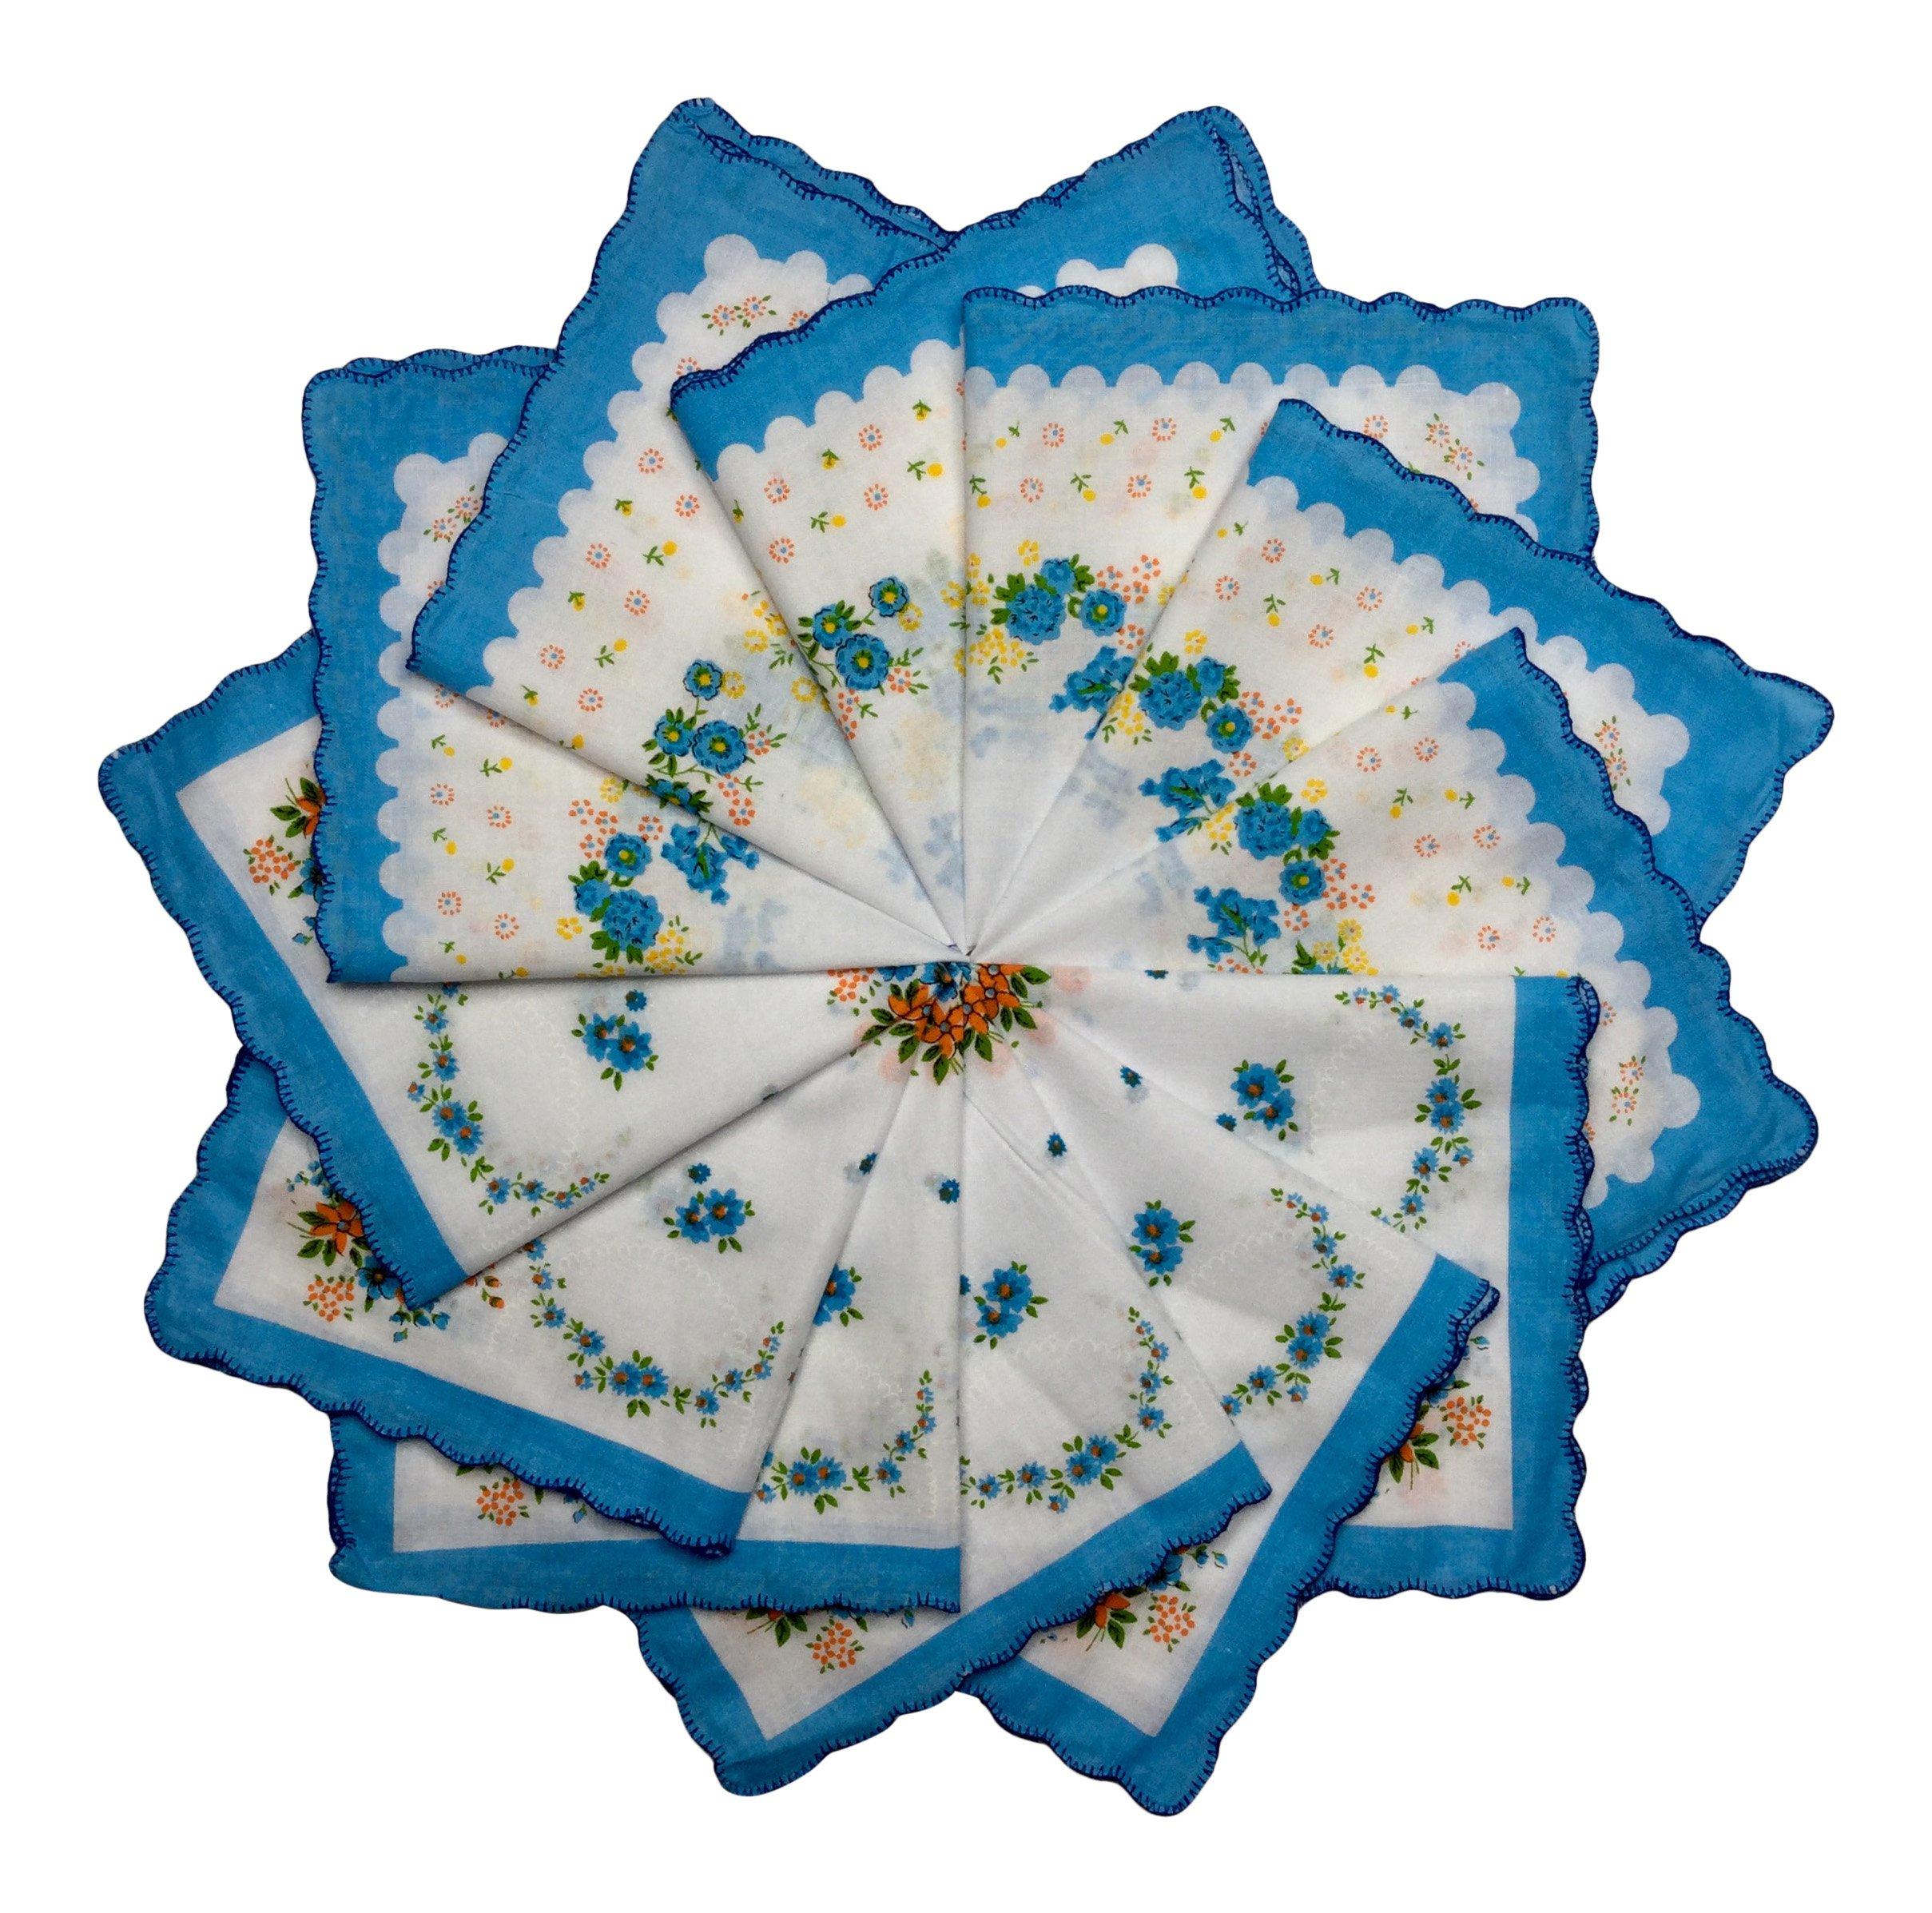 Women's Handkerchiefs 12 Pack Cotton Vintage Inspired Floral Designs (12 Bright Blue)